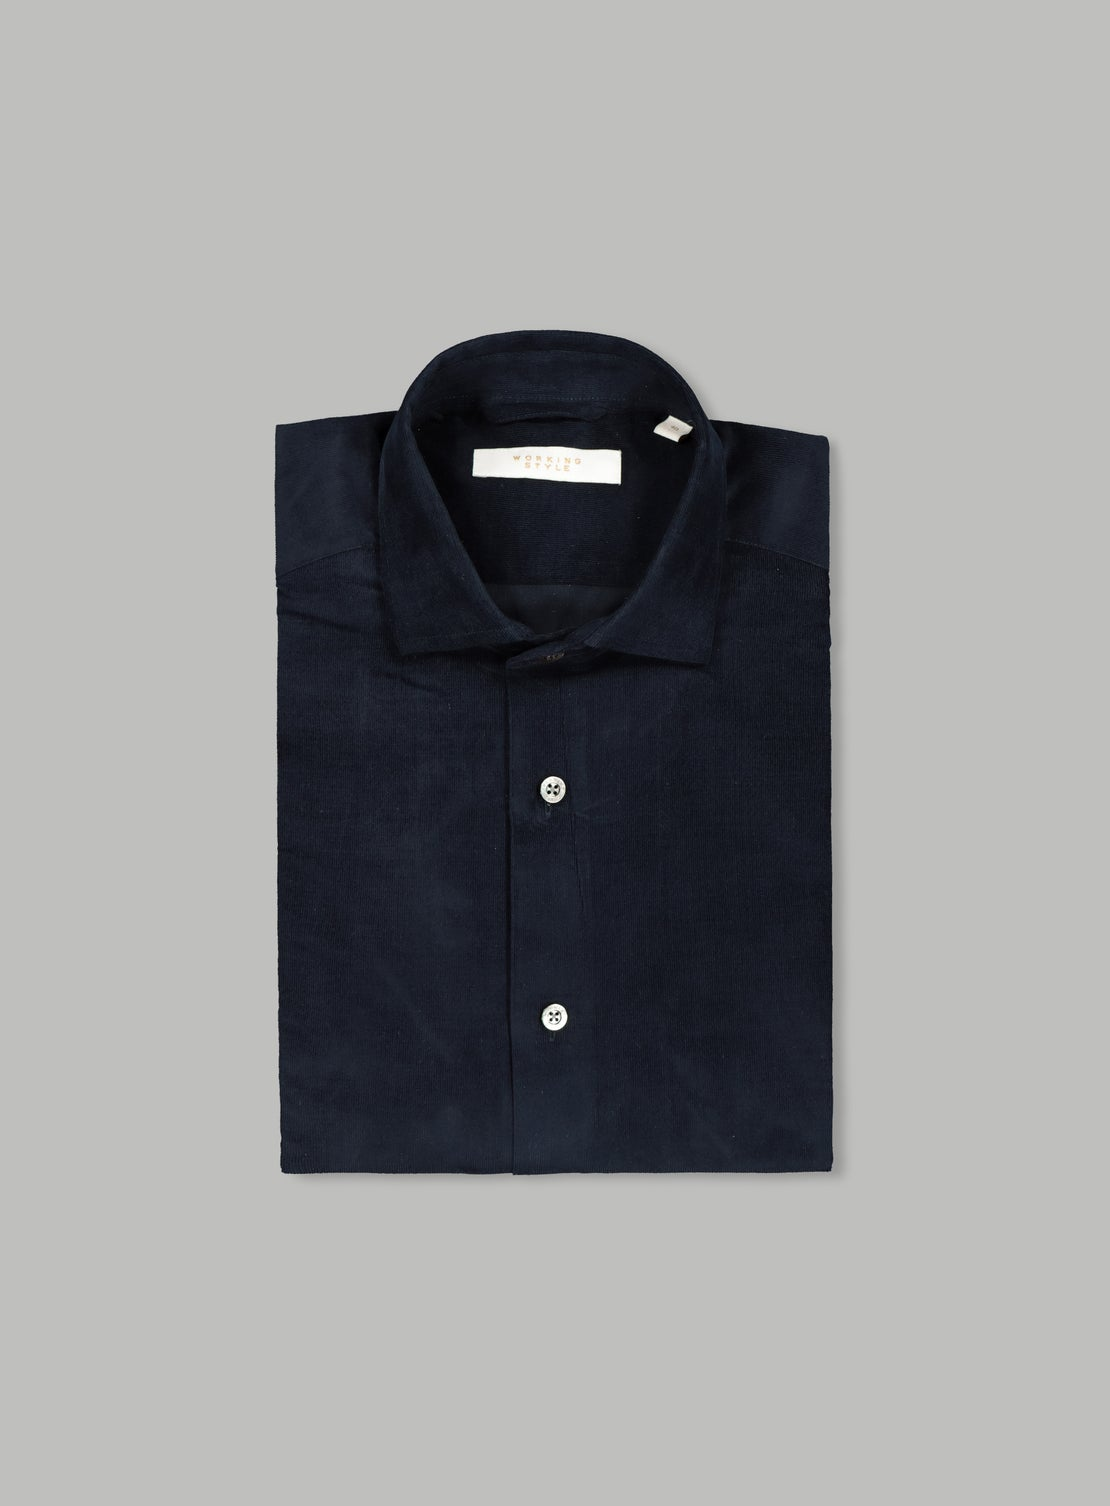 Rider Navy Cord Shirt